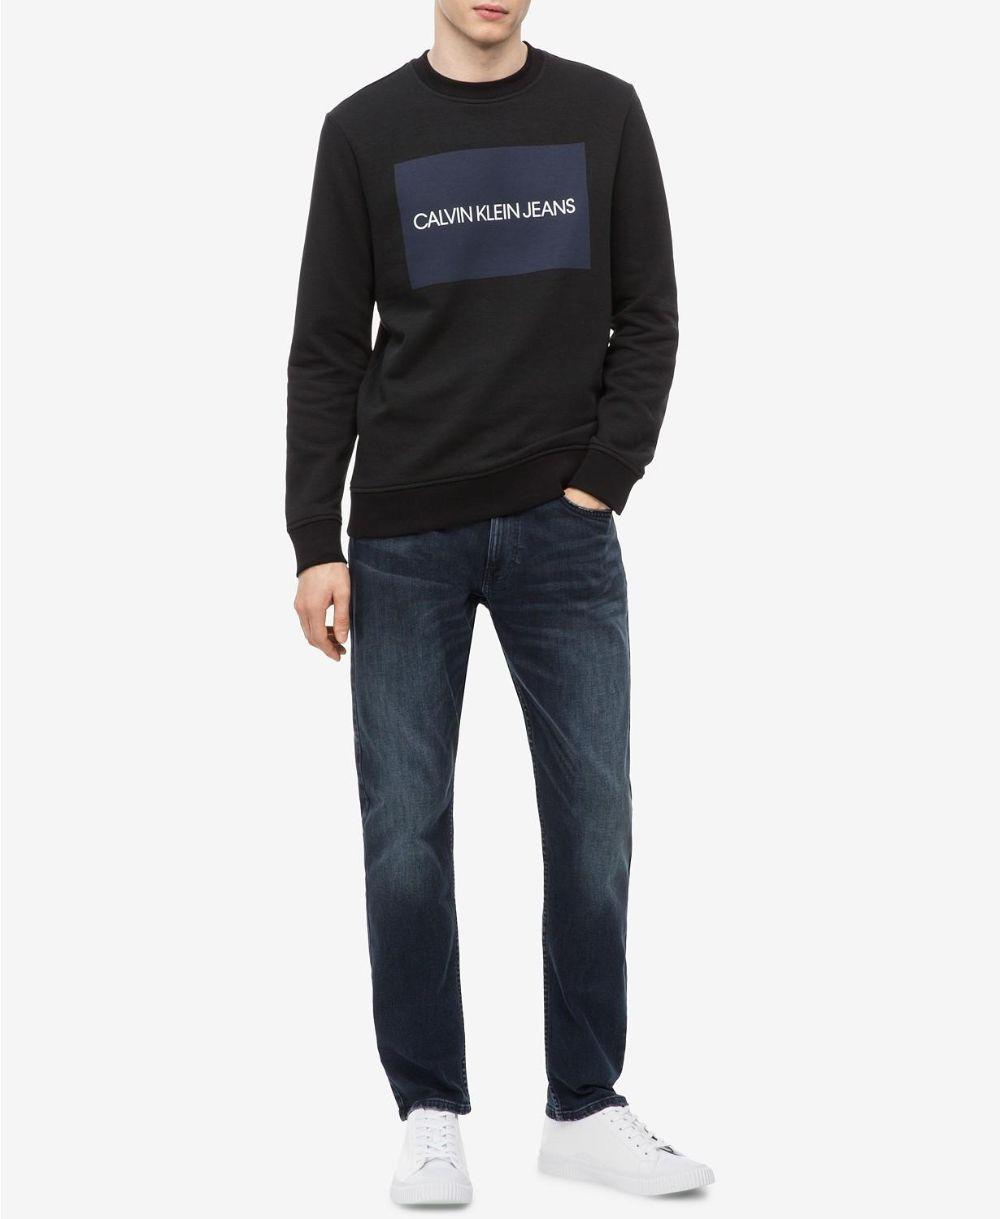 Calvin Klein CK牛仔裤 男士牛仔裤CKJ056 Tapered运动楔形牛仔裤